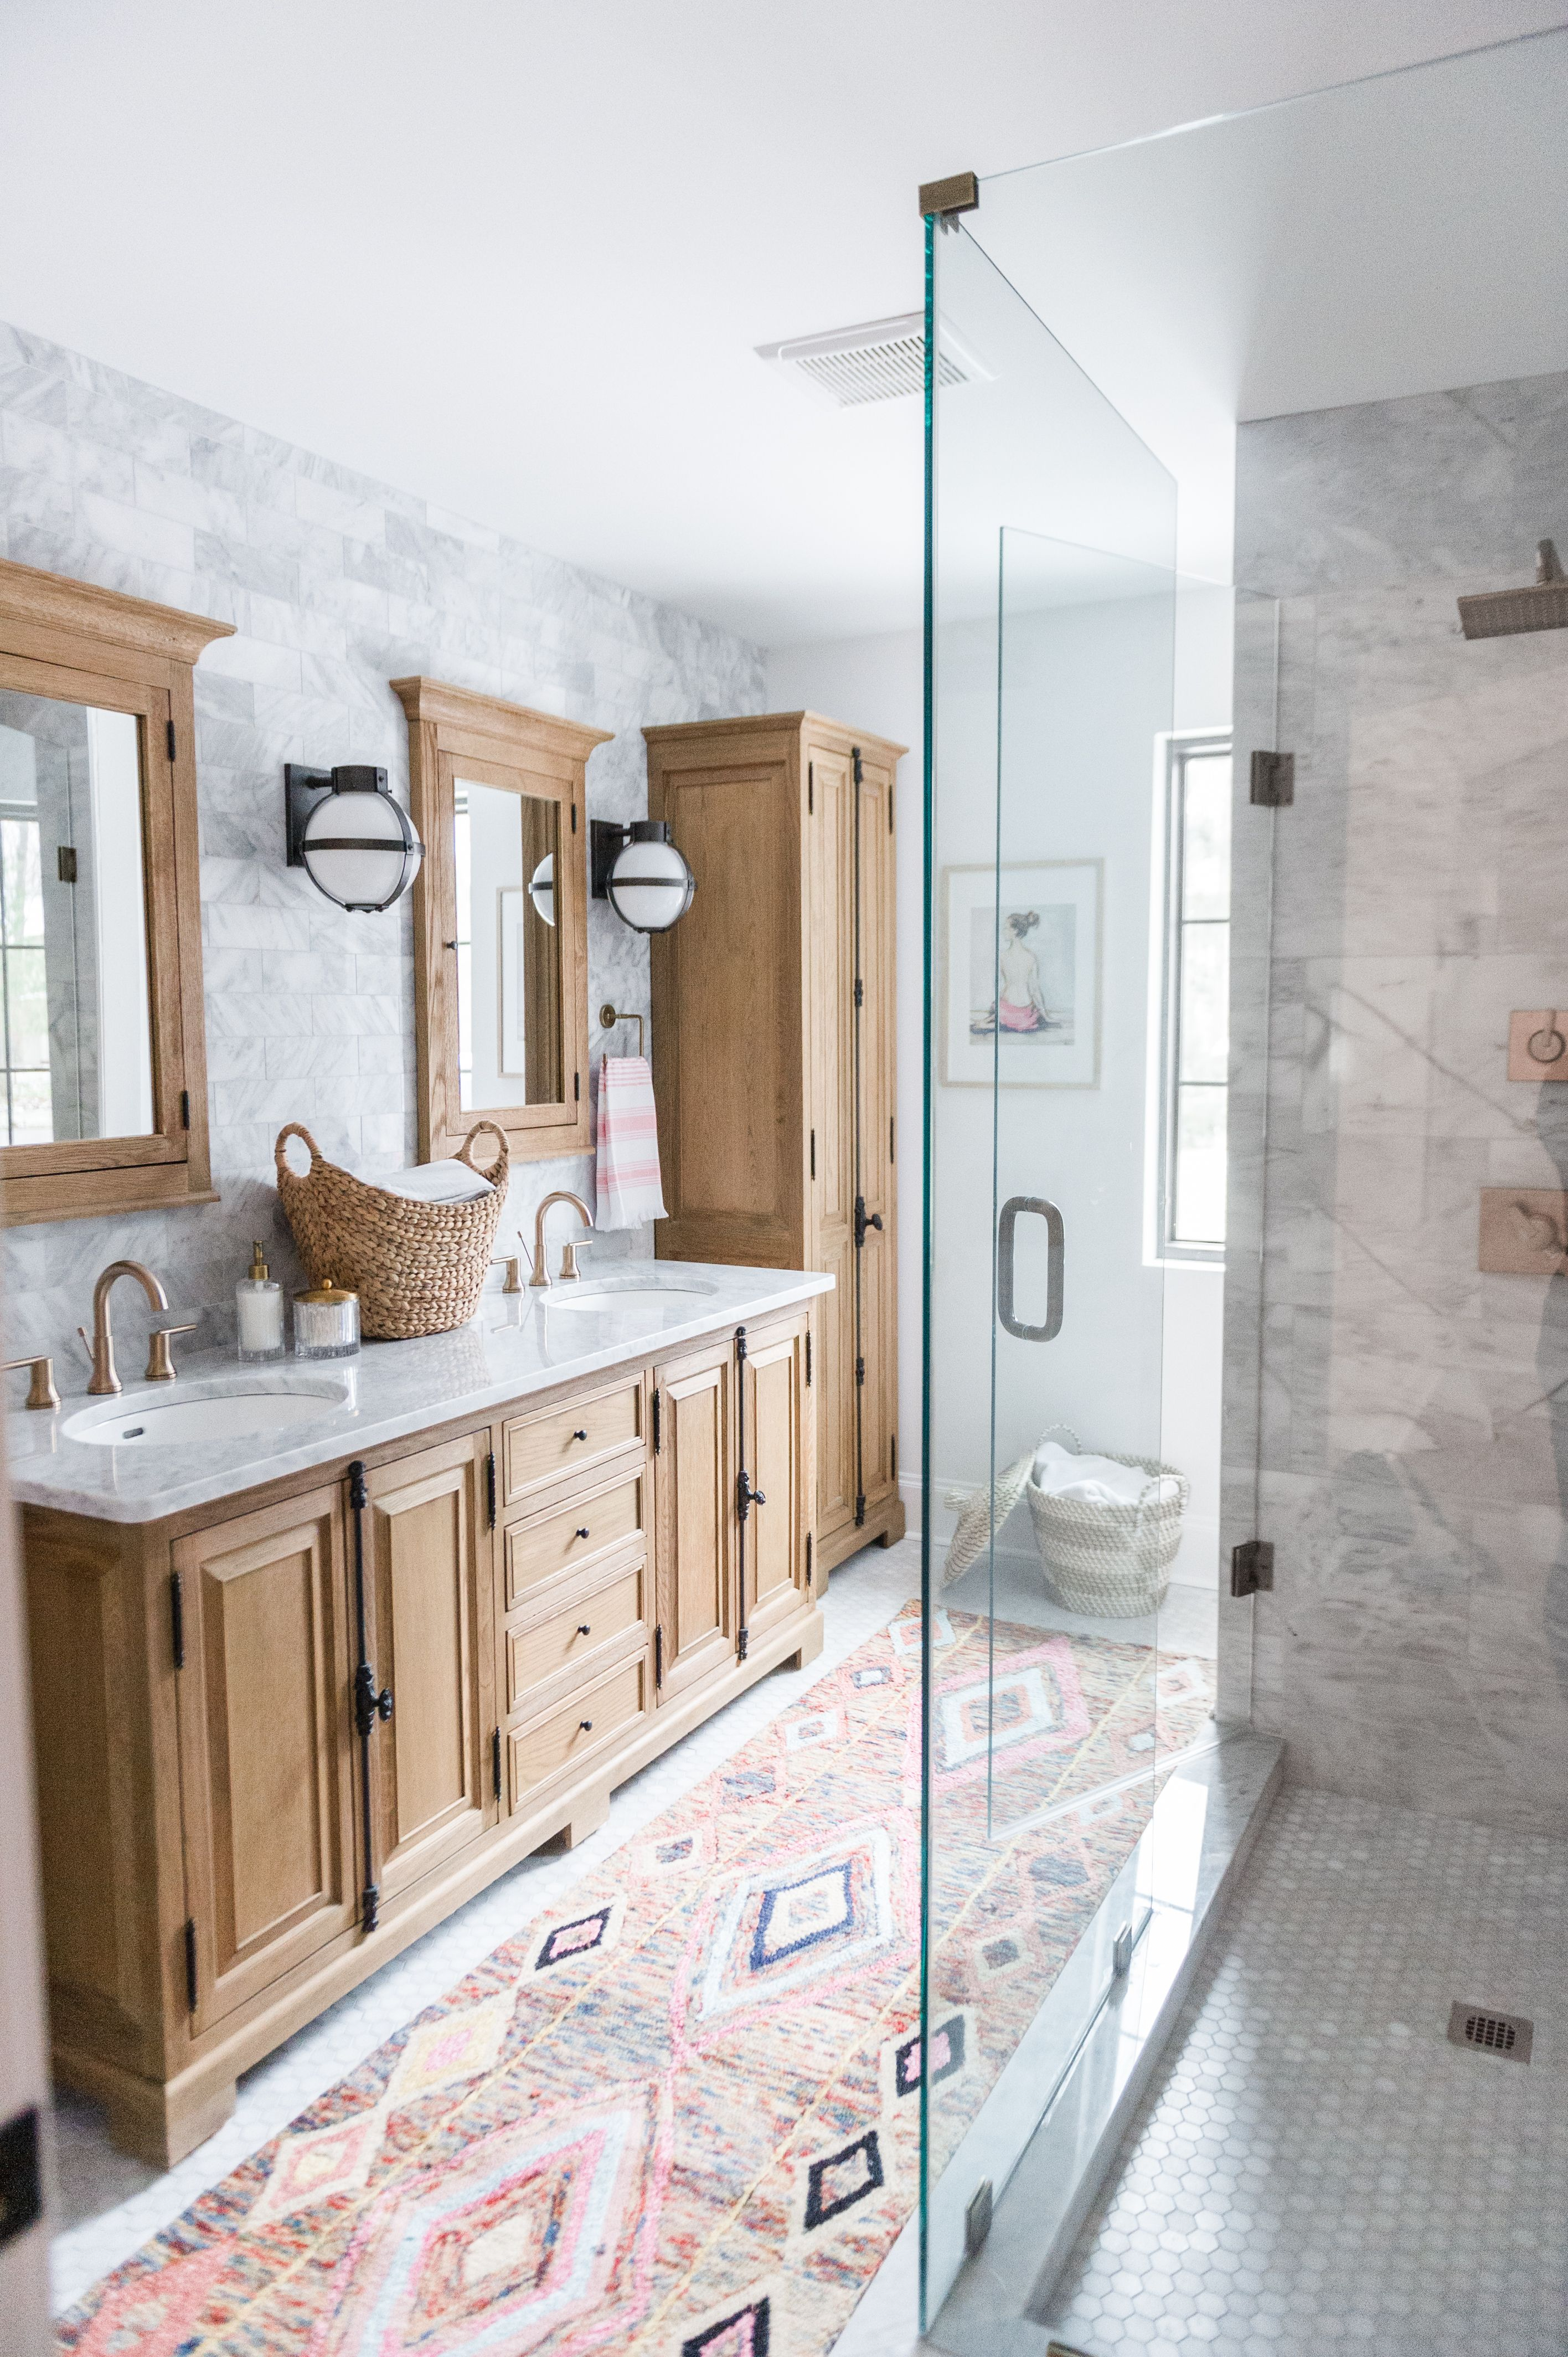 Modern Boho Bathroom Renovation Reveal in 2018 | Bathrooms Ideas ...